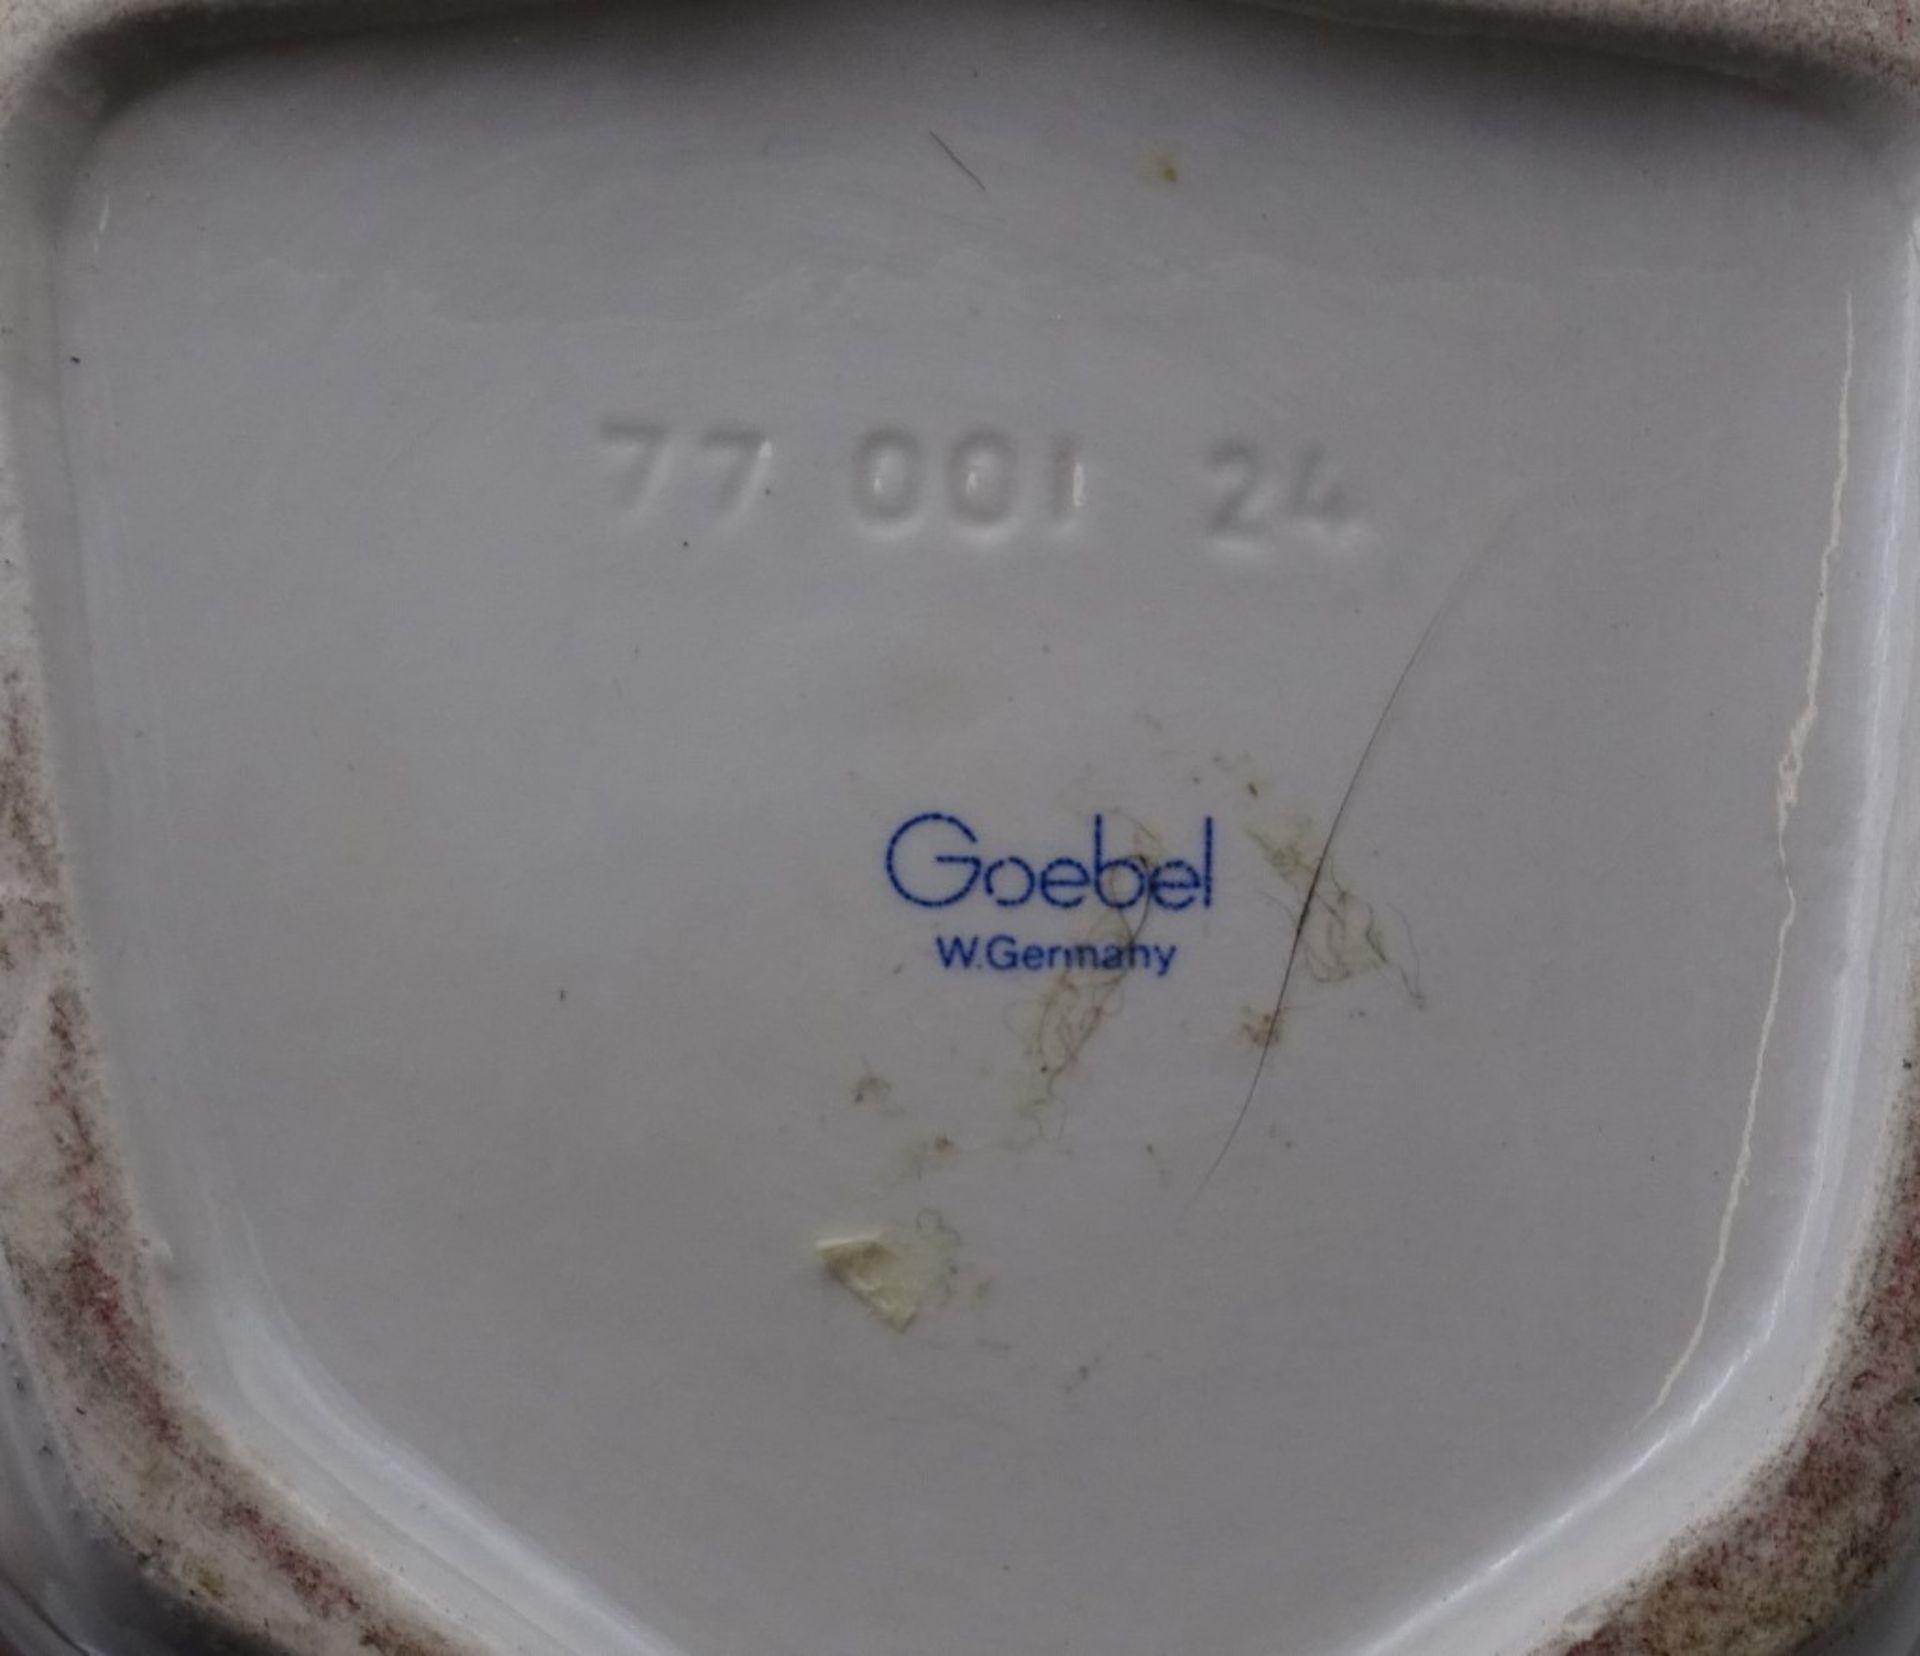 "Goebel Porzellan Kanne ""Katzenkanne""H-22,5cm - Bild 4 aus 5"